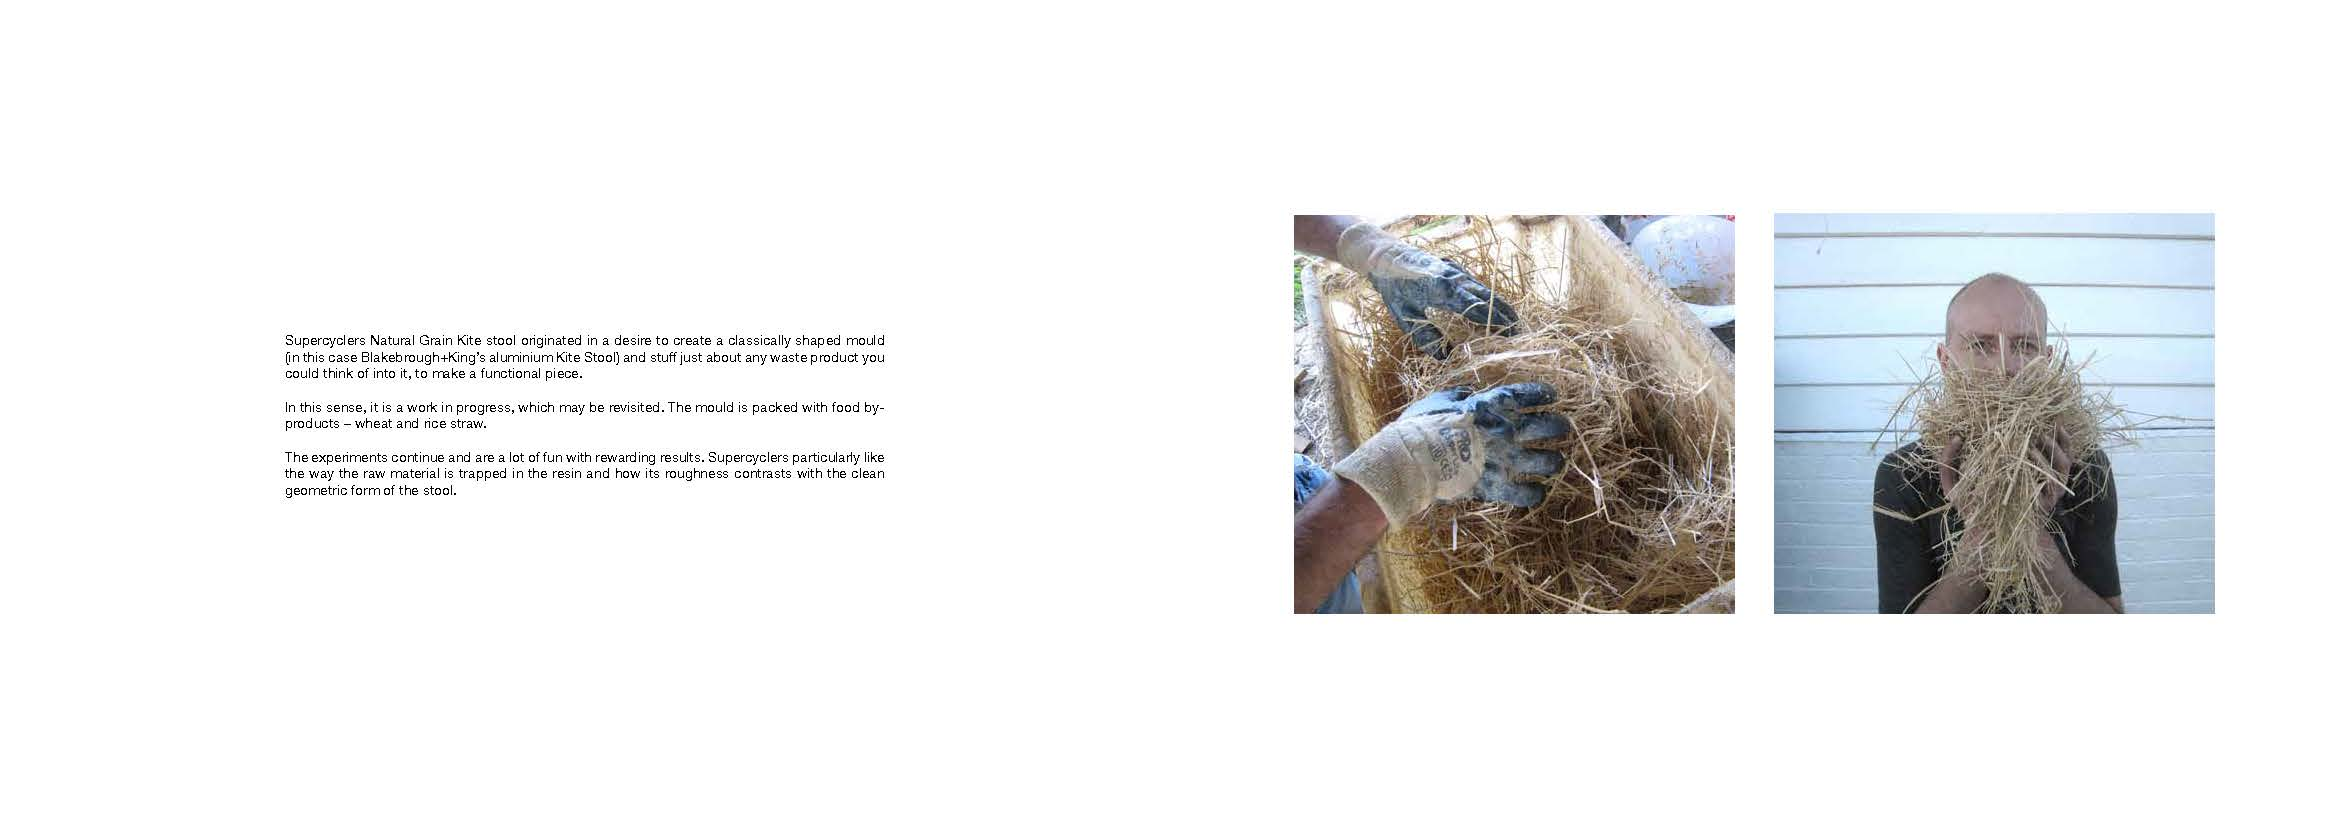 MANIFESTO MASTER FILE 221214 _Page_146.jpg